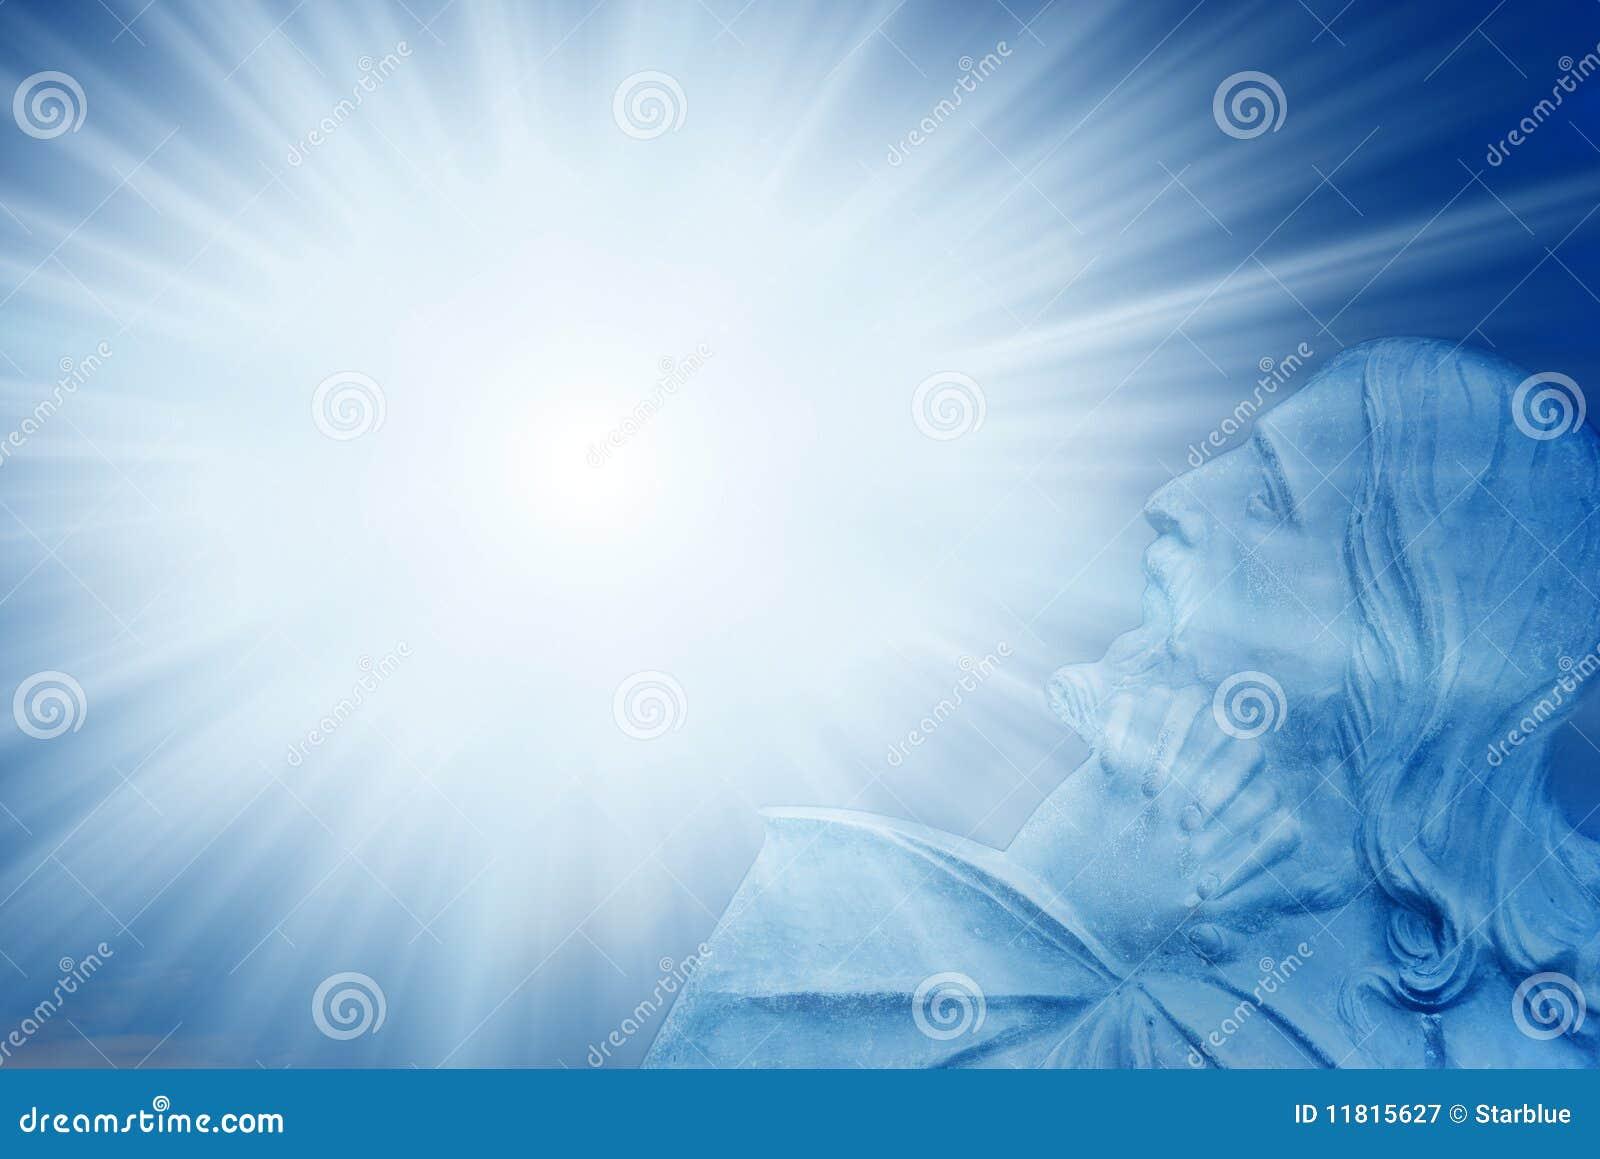 Christ Divine Jesus Light Lighting A Divine Lighting & Divine Lighting NordluxUK Twitter azcodes.com